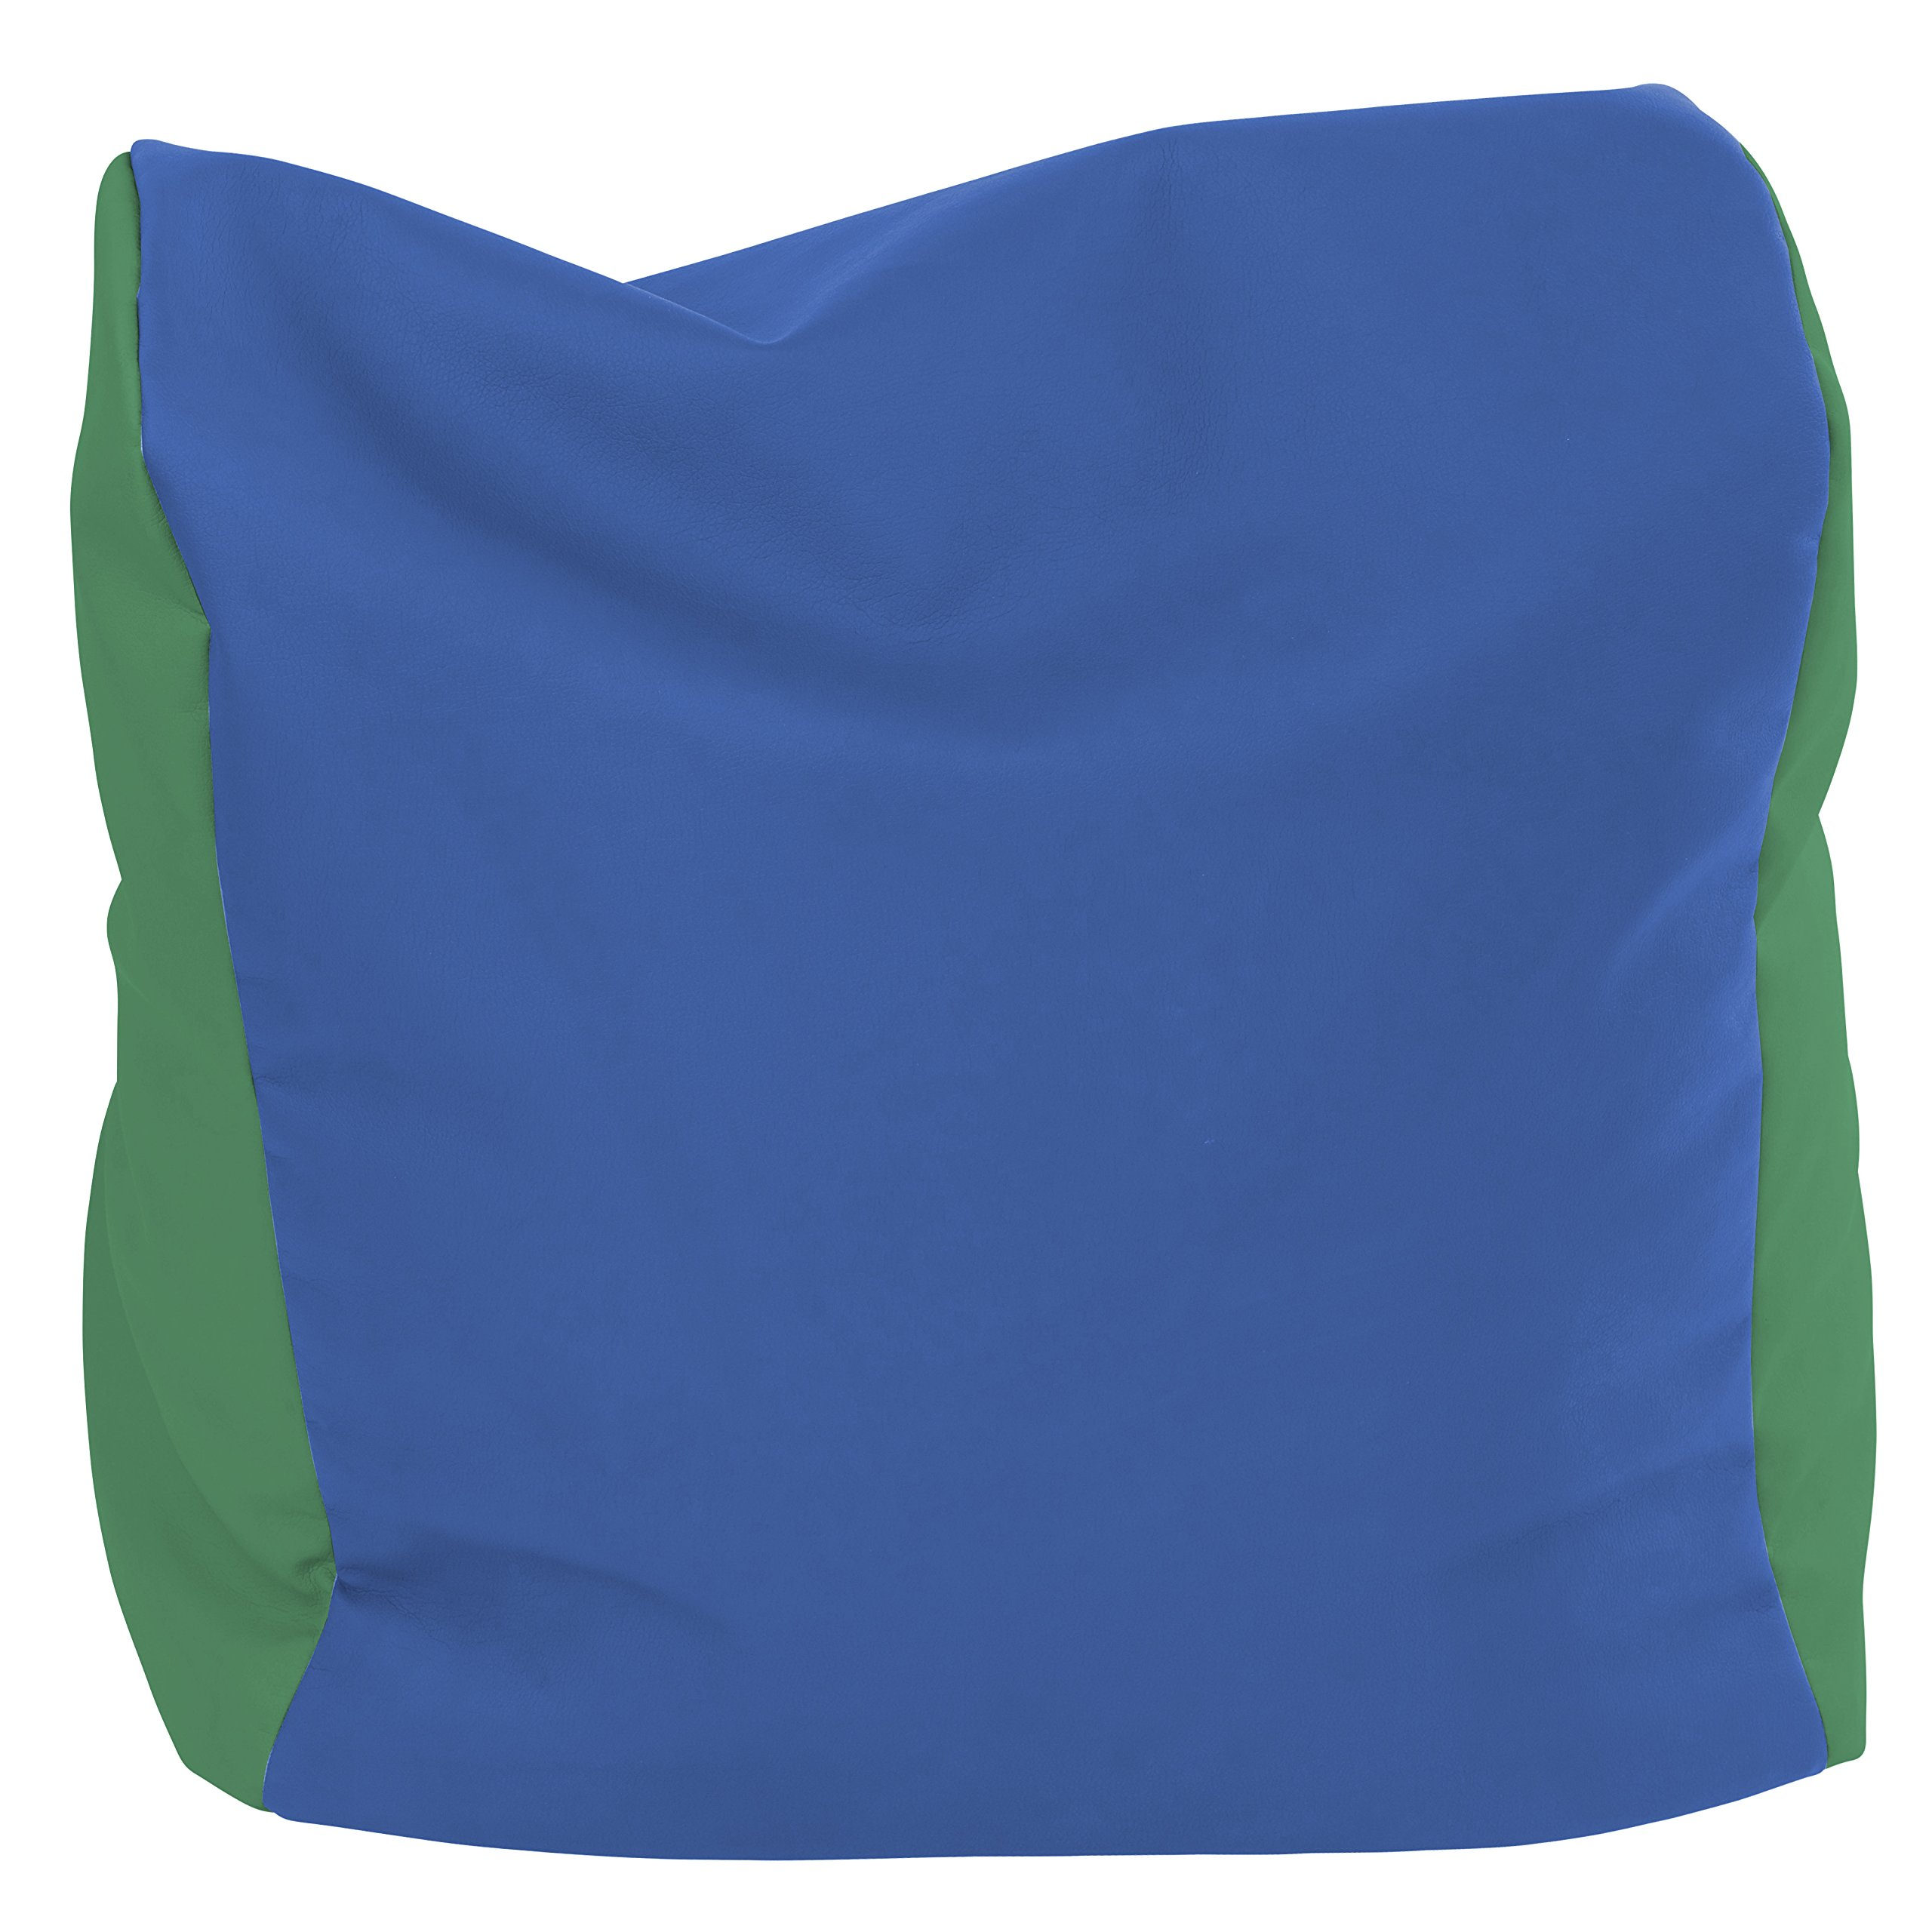 ECR4Kids SoftZone Youth Bean Bag Soft Seat, Blue and Green